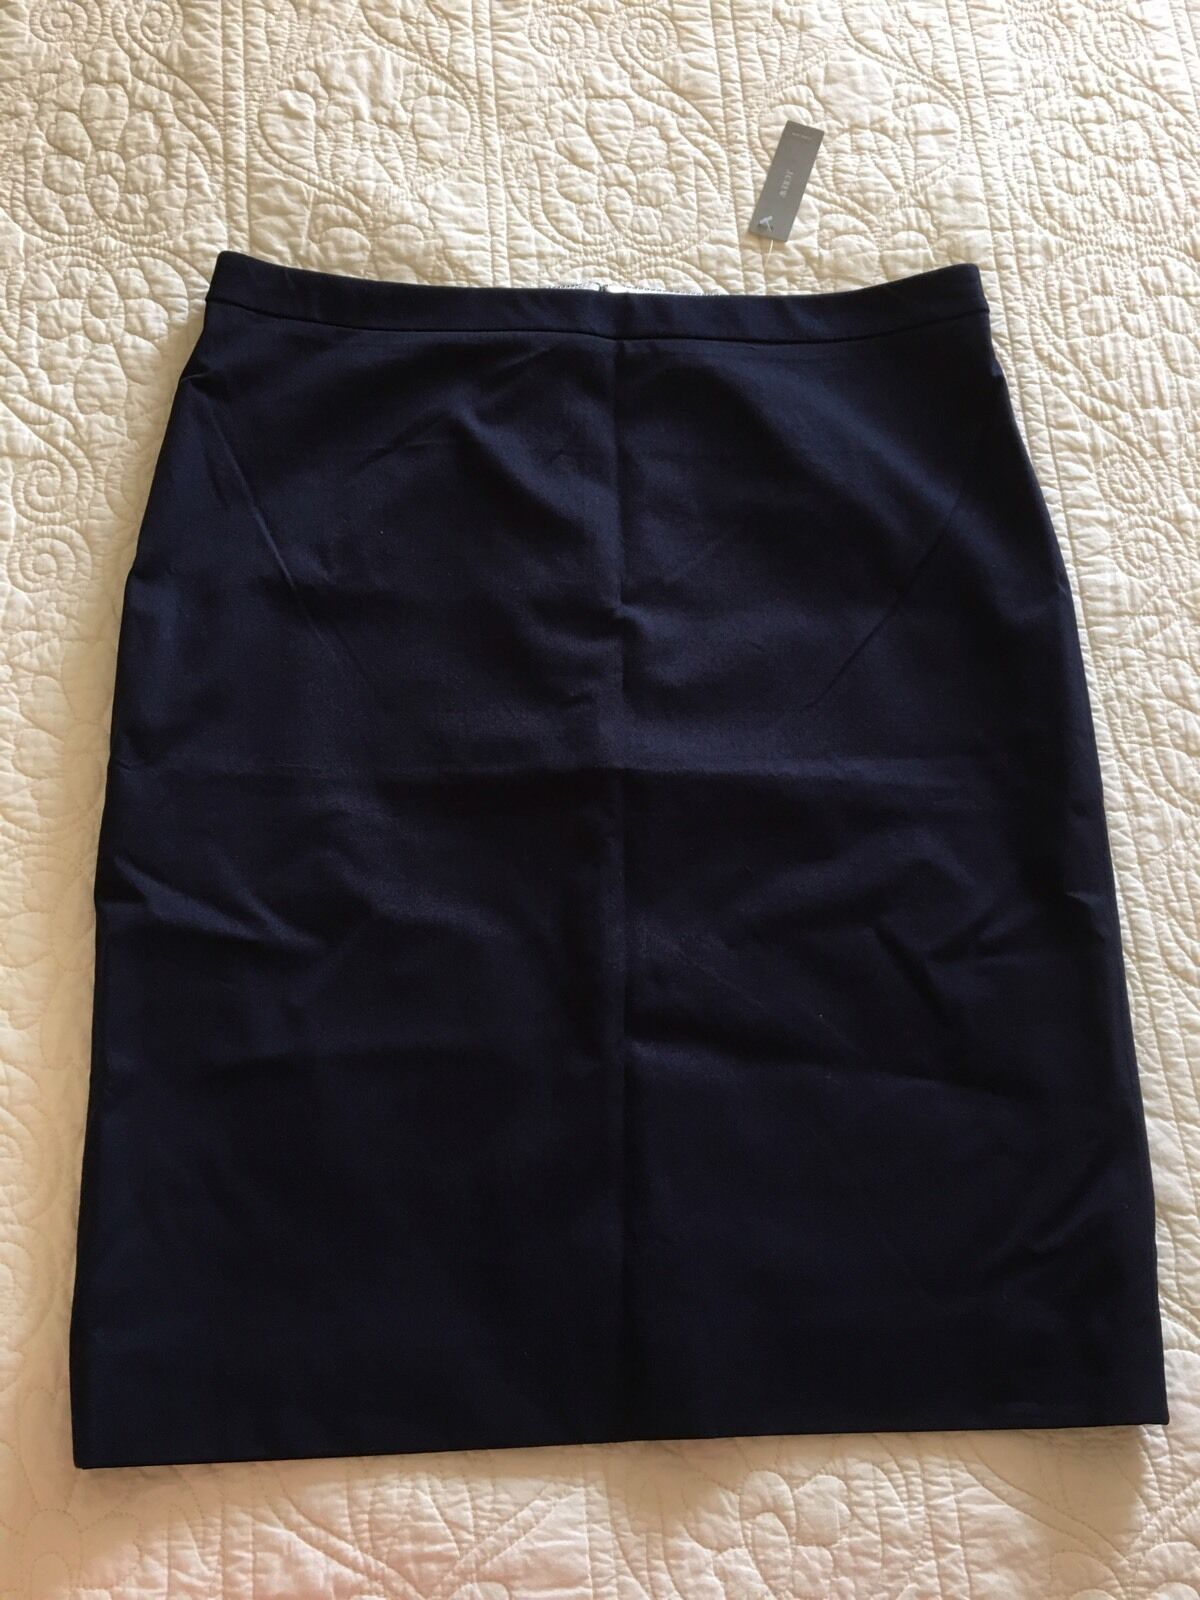 New JCREW Tall pencil skirt in bi-stretch cotton G3065 14T navy SPRING '17